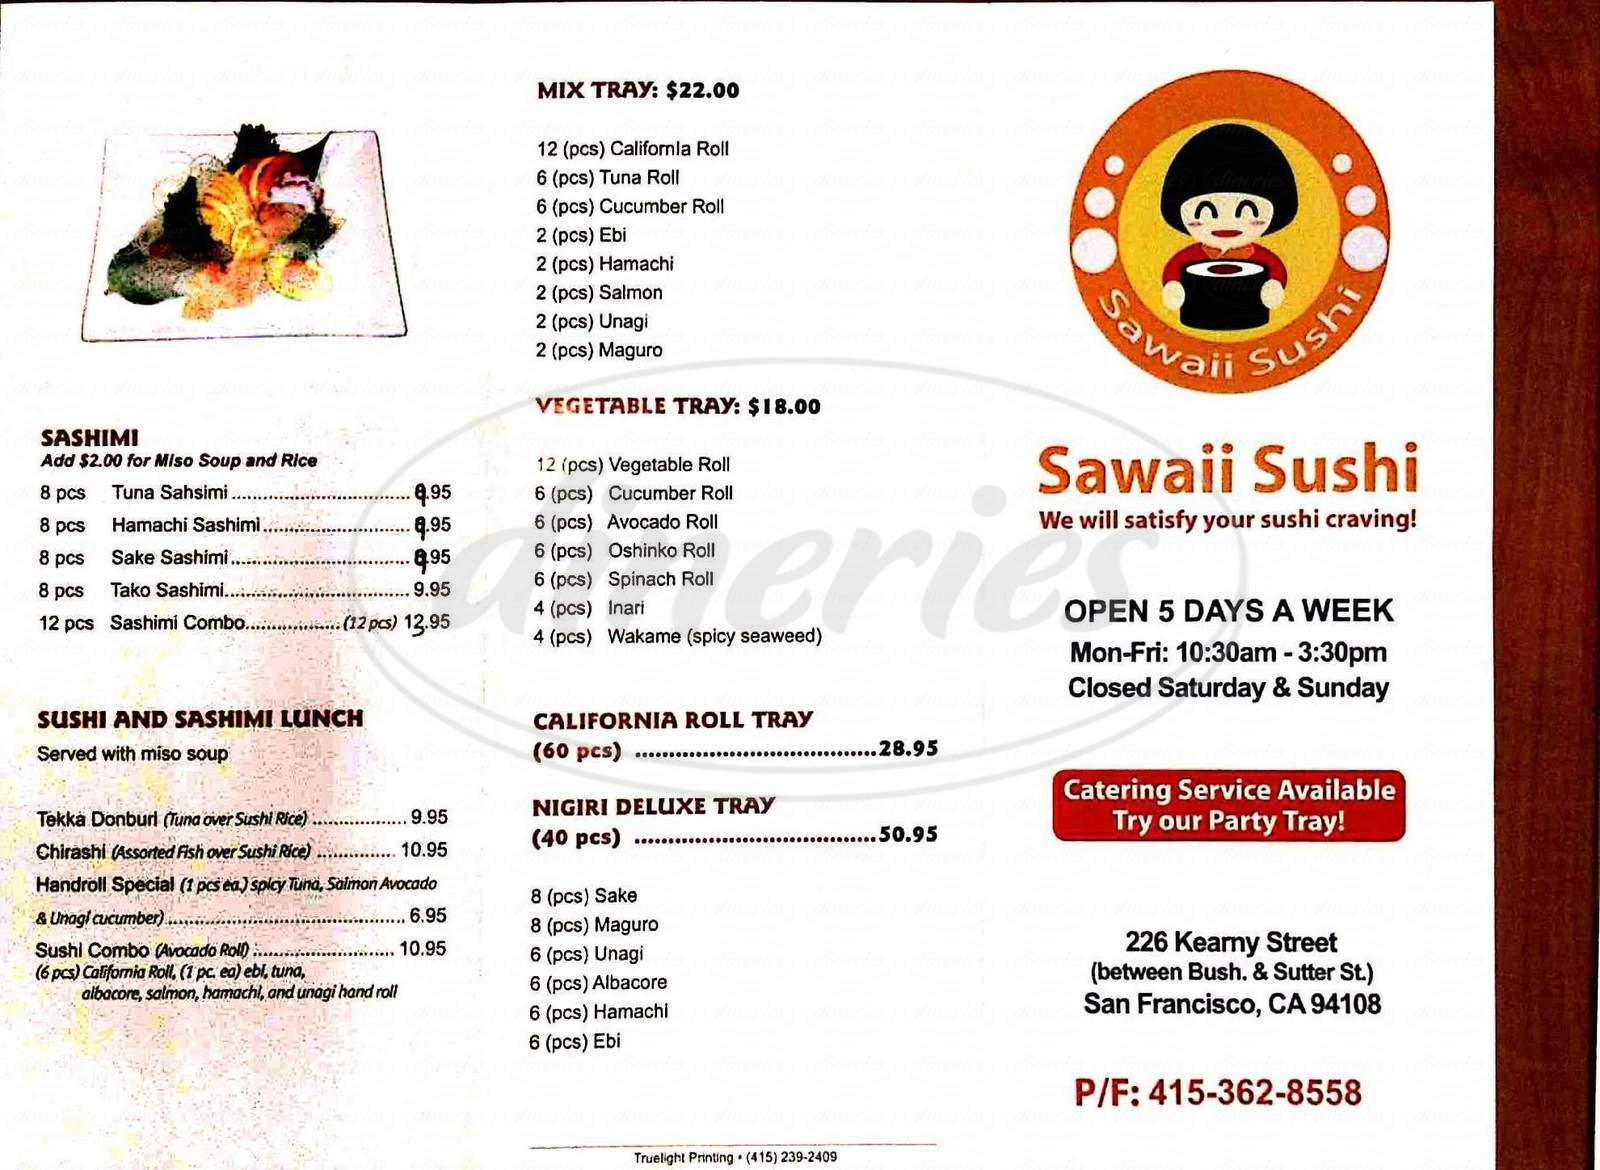 menu for Sawaii Sushi